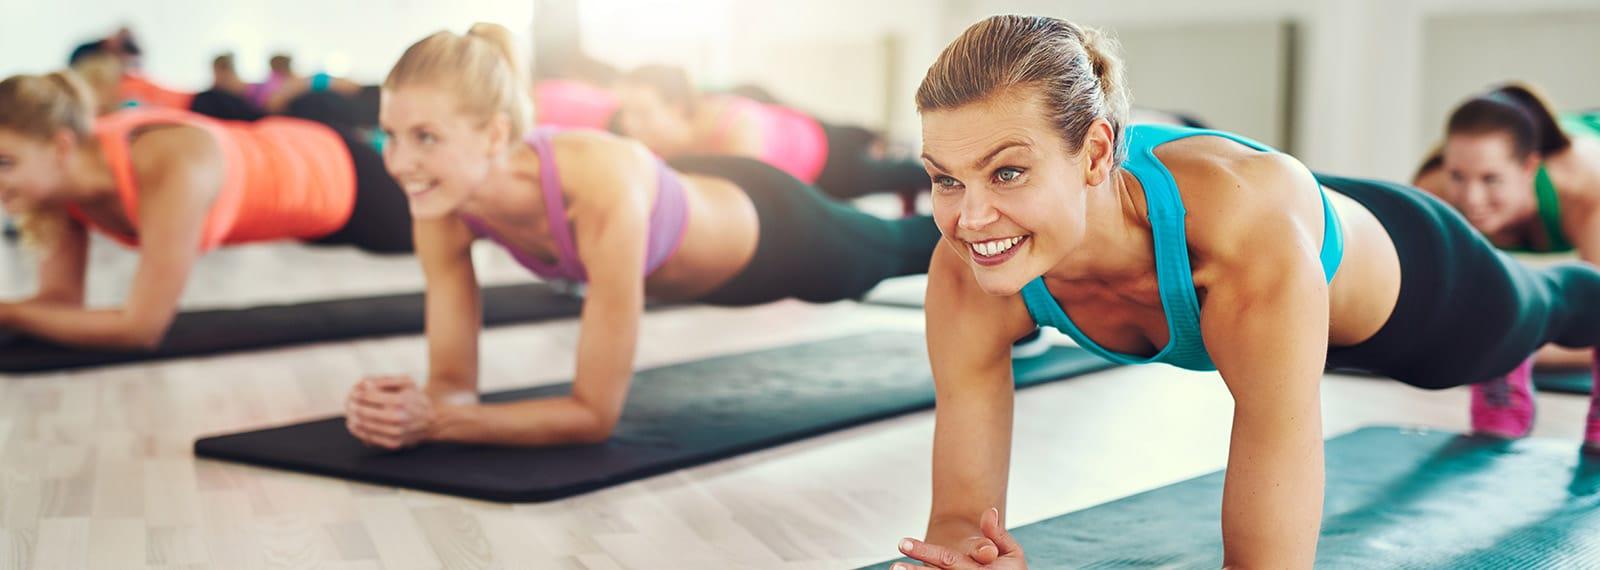 Vertretung eines Fitness-Kurses